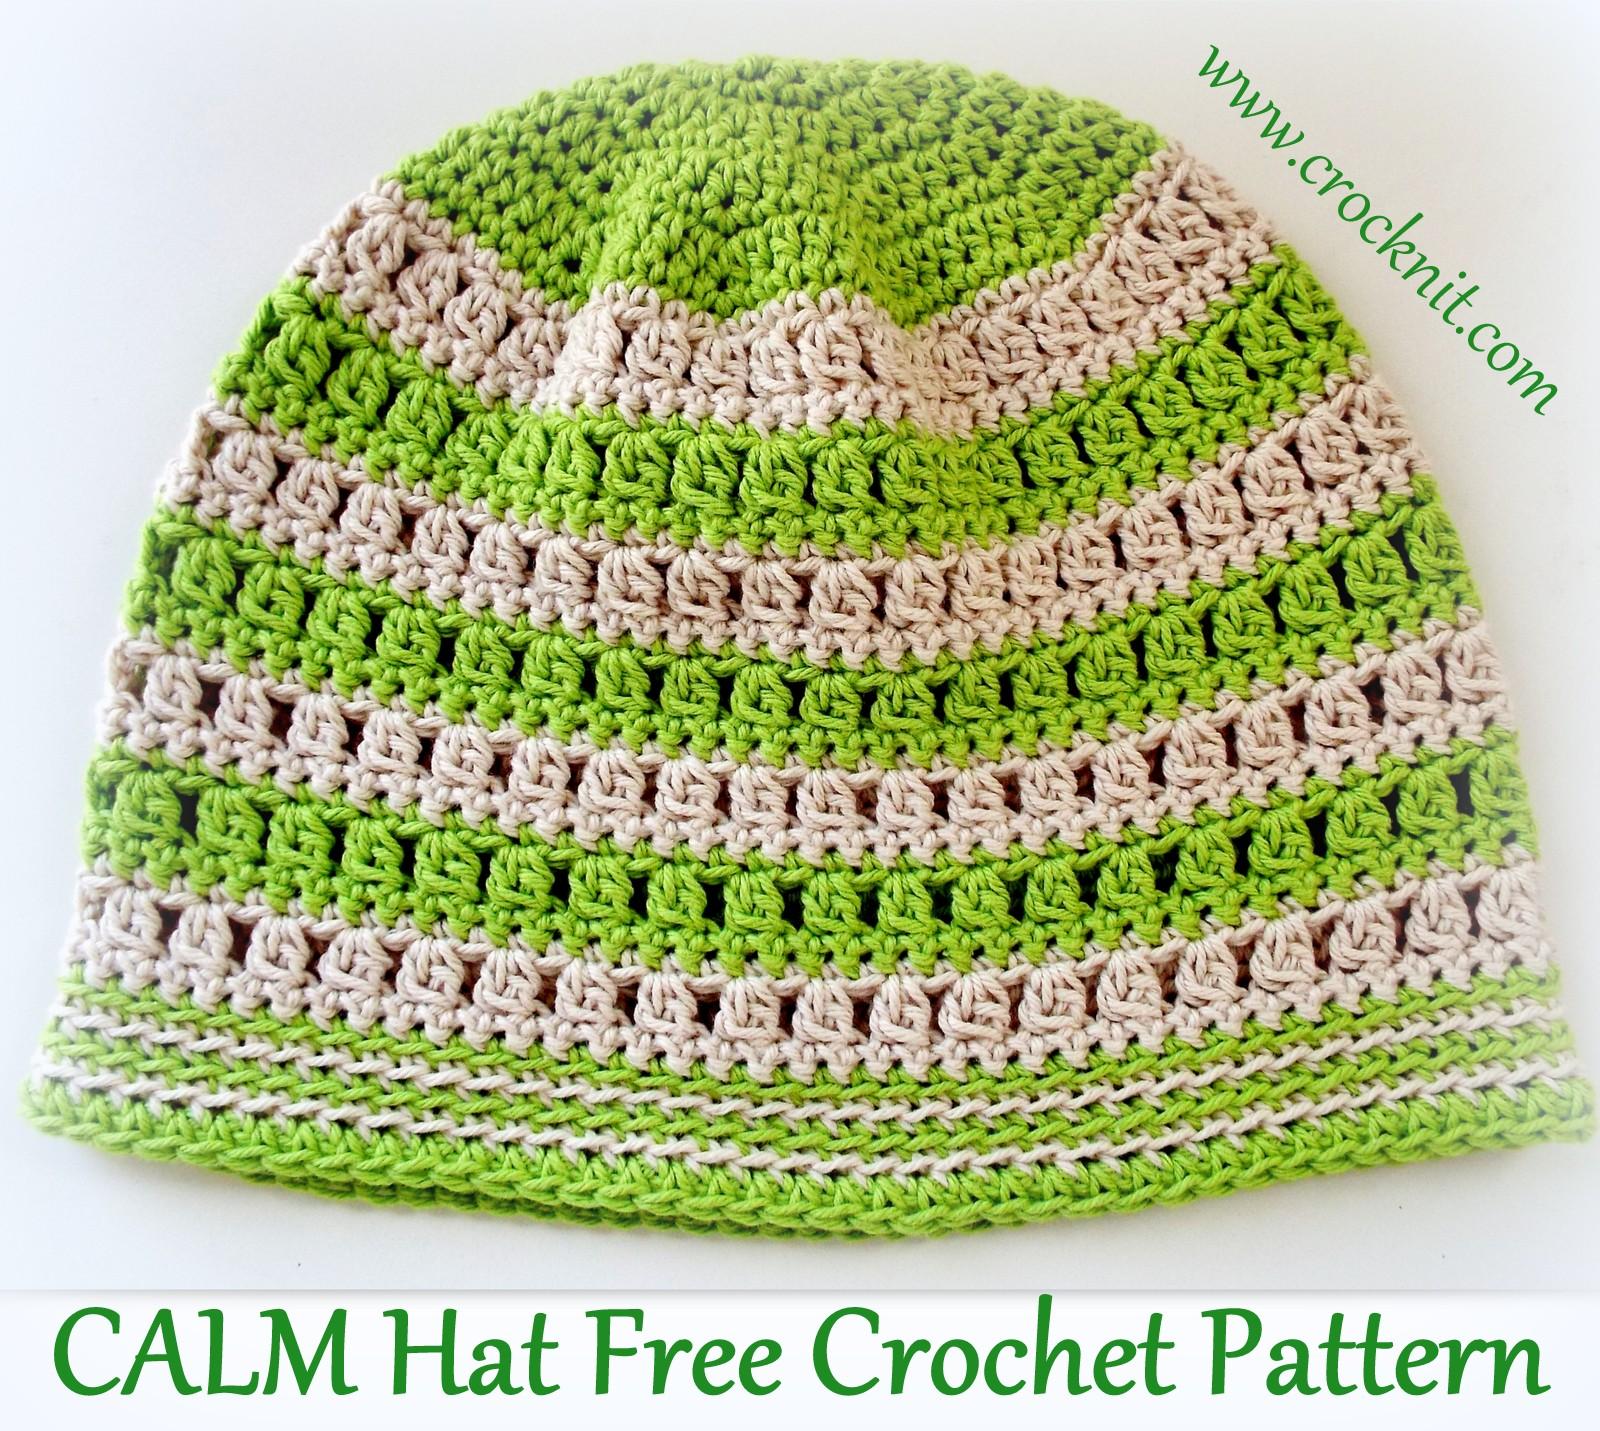 MICROCKNIT CREATIONS  SLEEP Hats Free Crochet Pattern  4 CALM HAT a4116b7ff0c